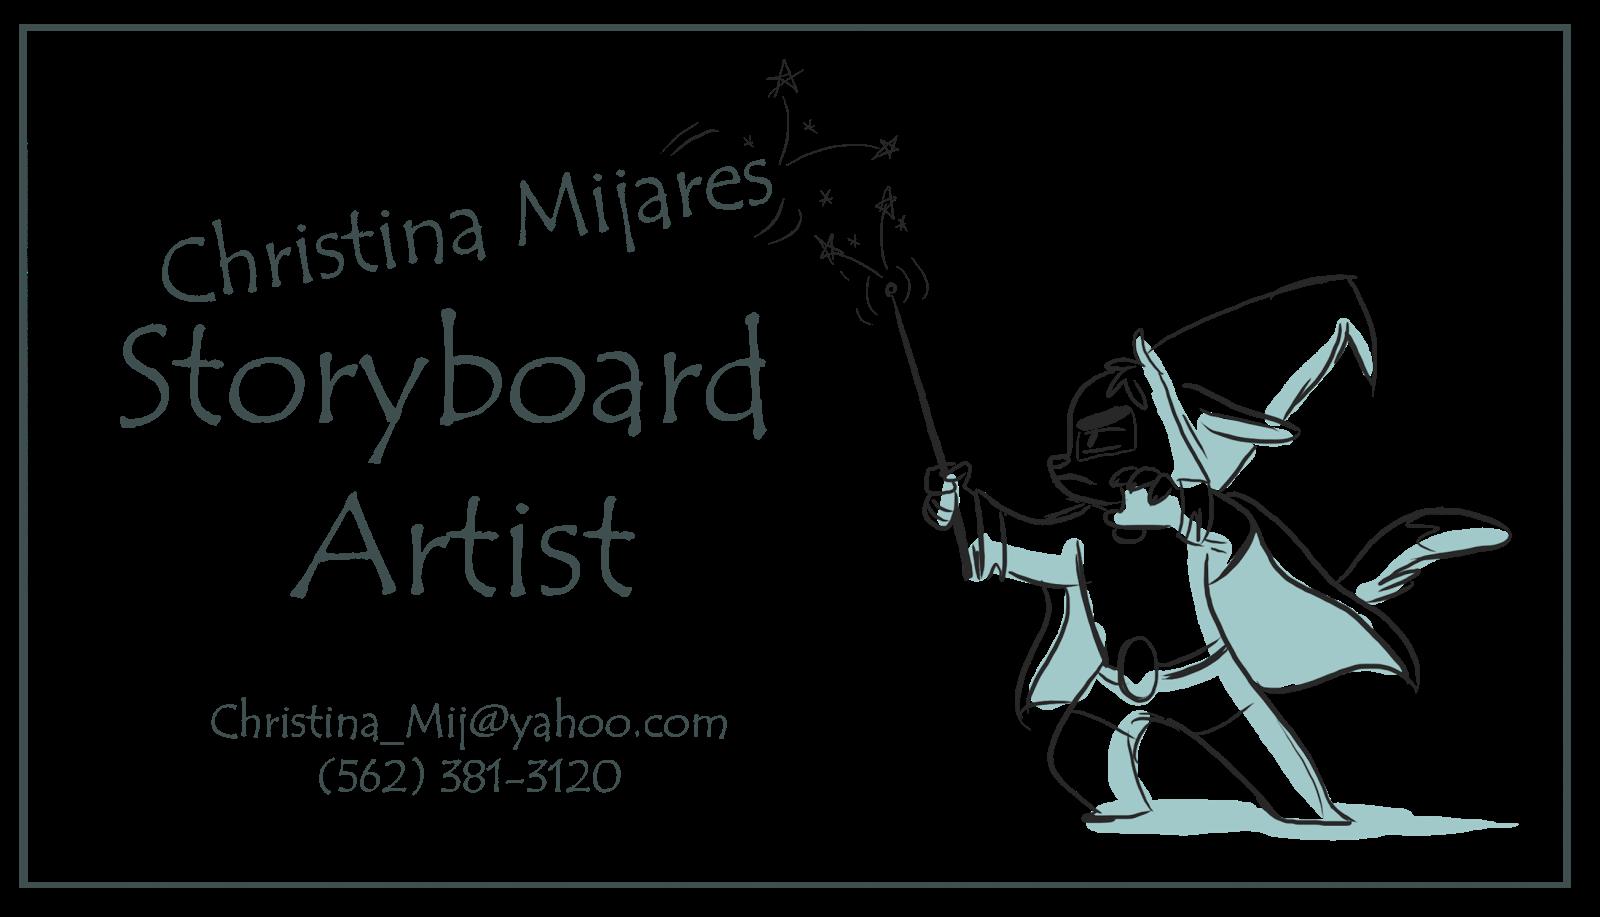 Christina Mijares' Storyboard Portfolio